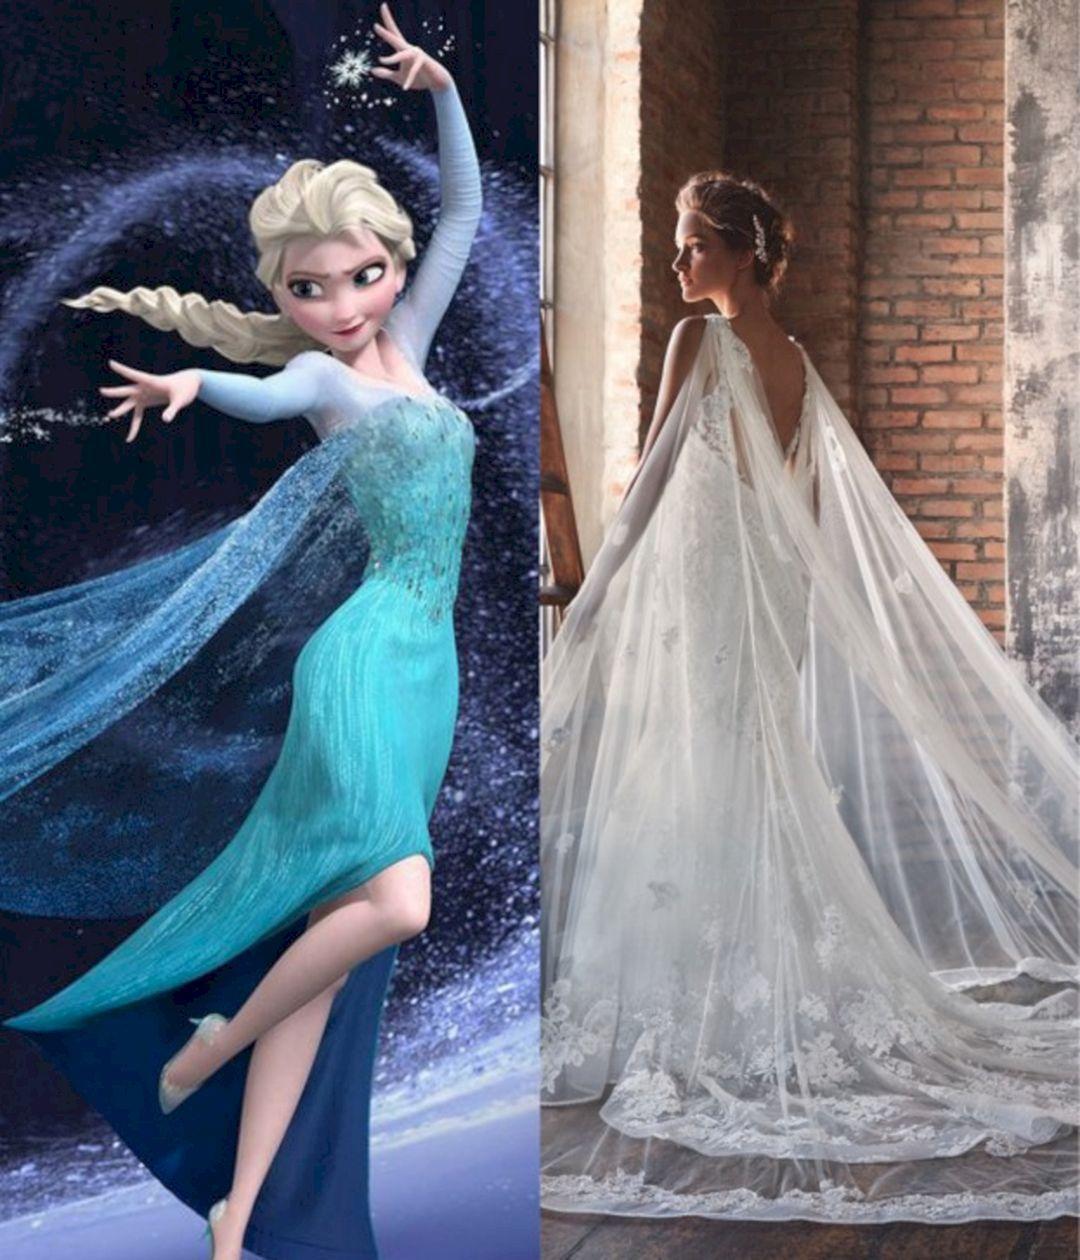 Princess Wedding Dresses Ball Gown 10 Disney Wedding Dresses Disney Princess Wedding Dresses Disney Princess Wedding [ 1260 x 1080 Pixel ]